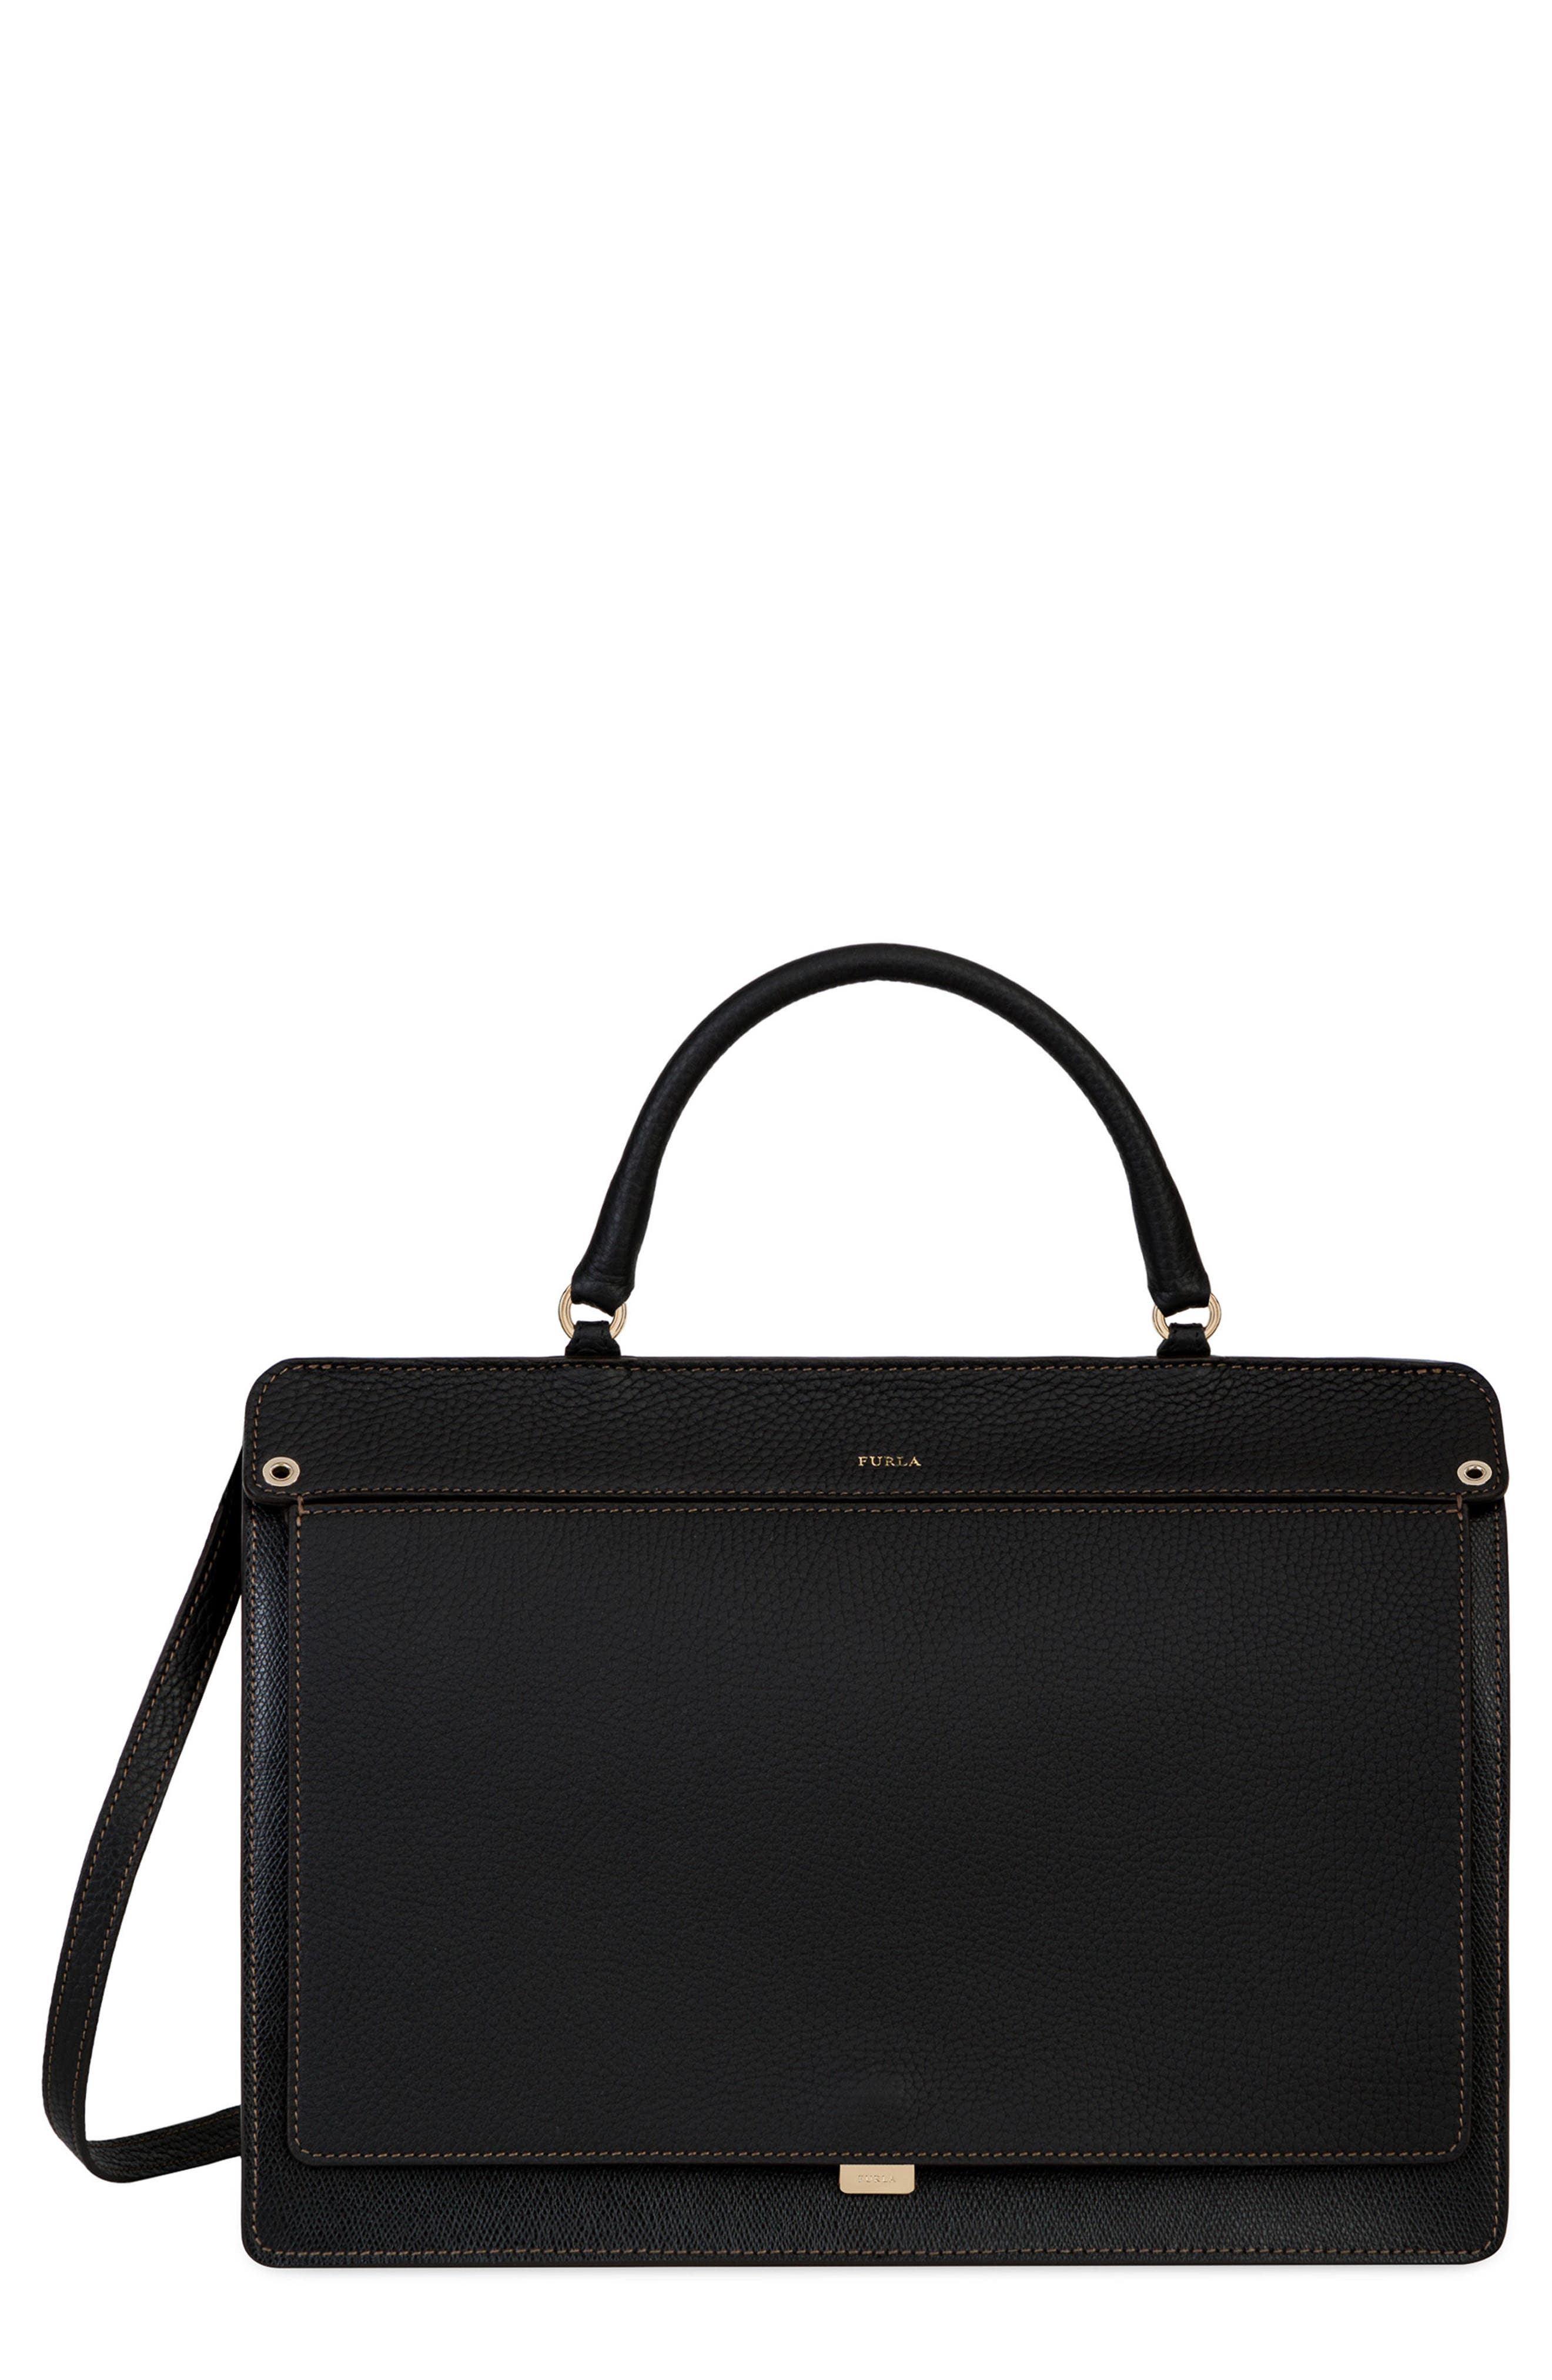 Main Image - Furla Small Like Leather Top Handle Convertible Satchel